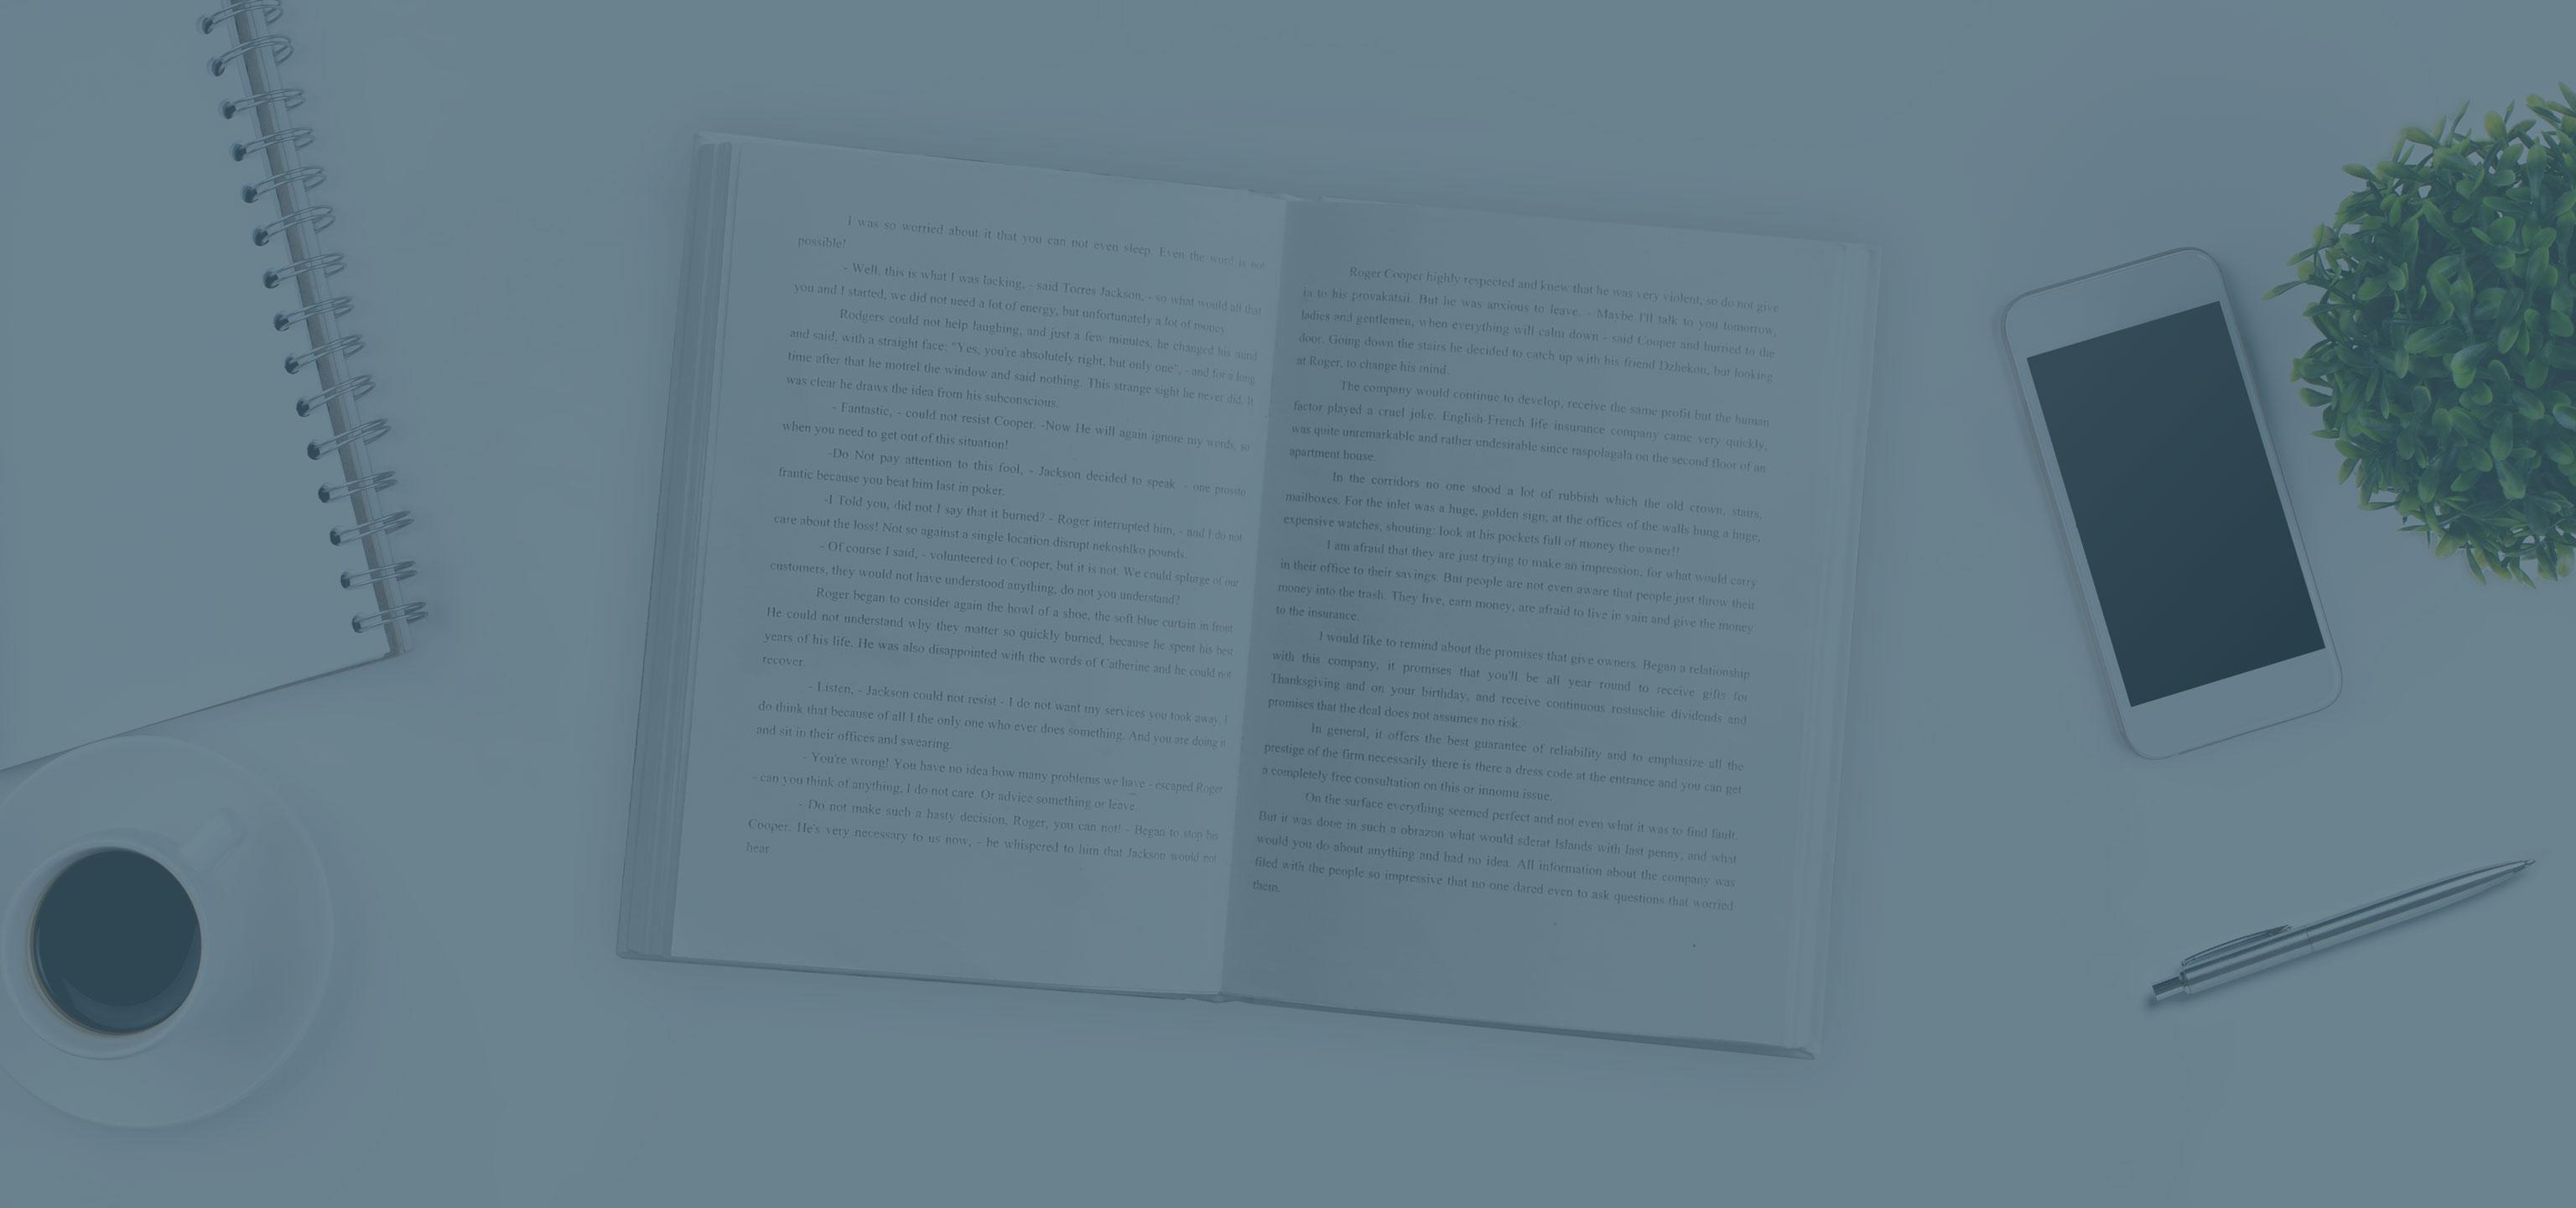 IngramSpark Free Revisions Through May 31, 2018